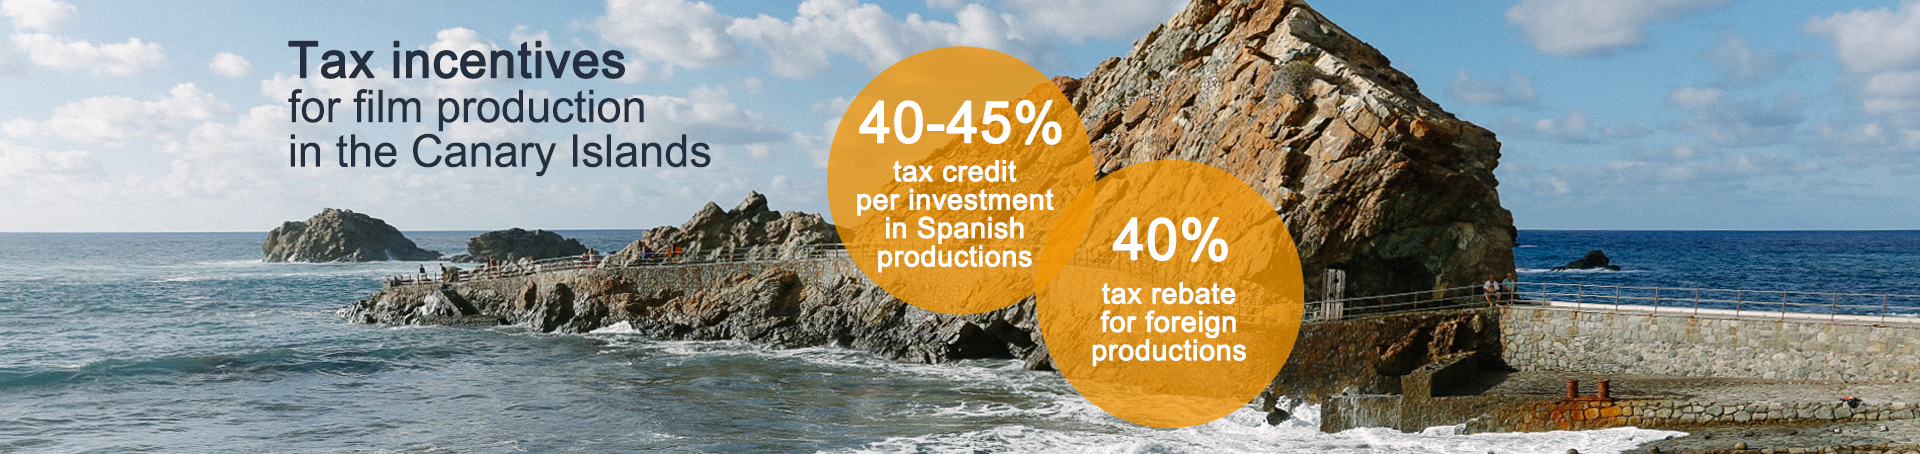 service_7ifilm_tax_incentives_cliffs_header_9_17